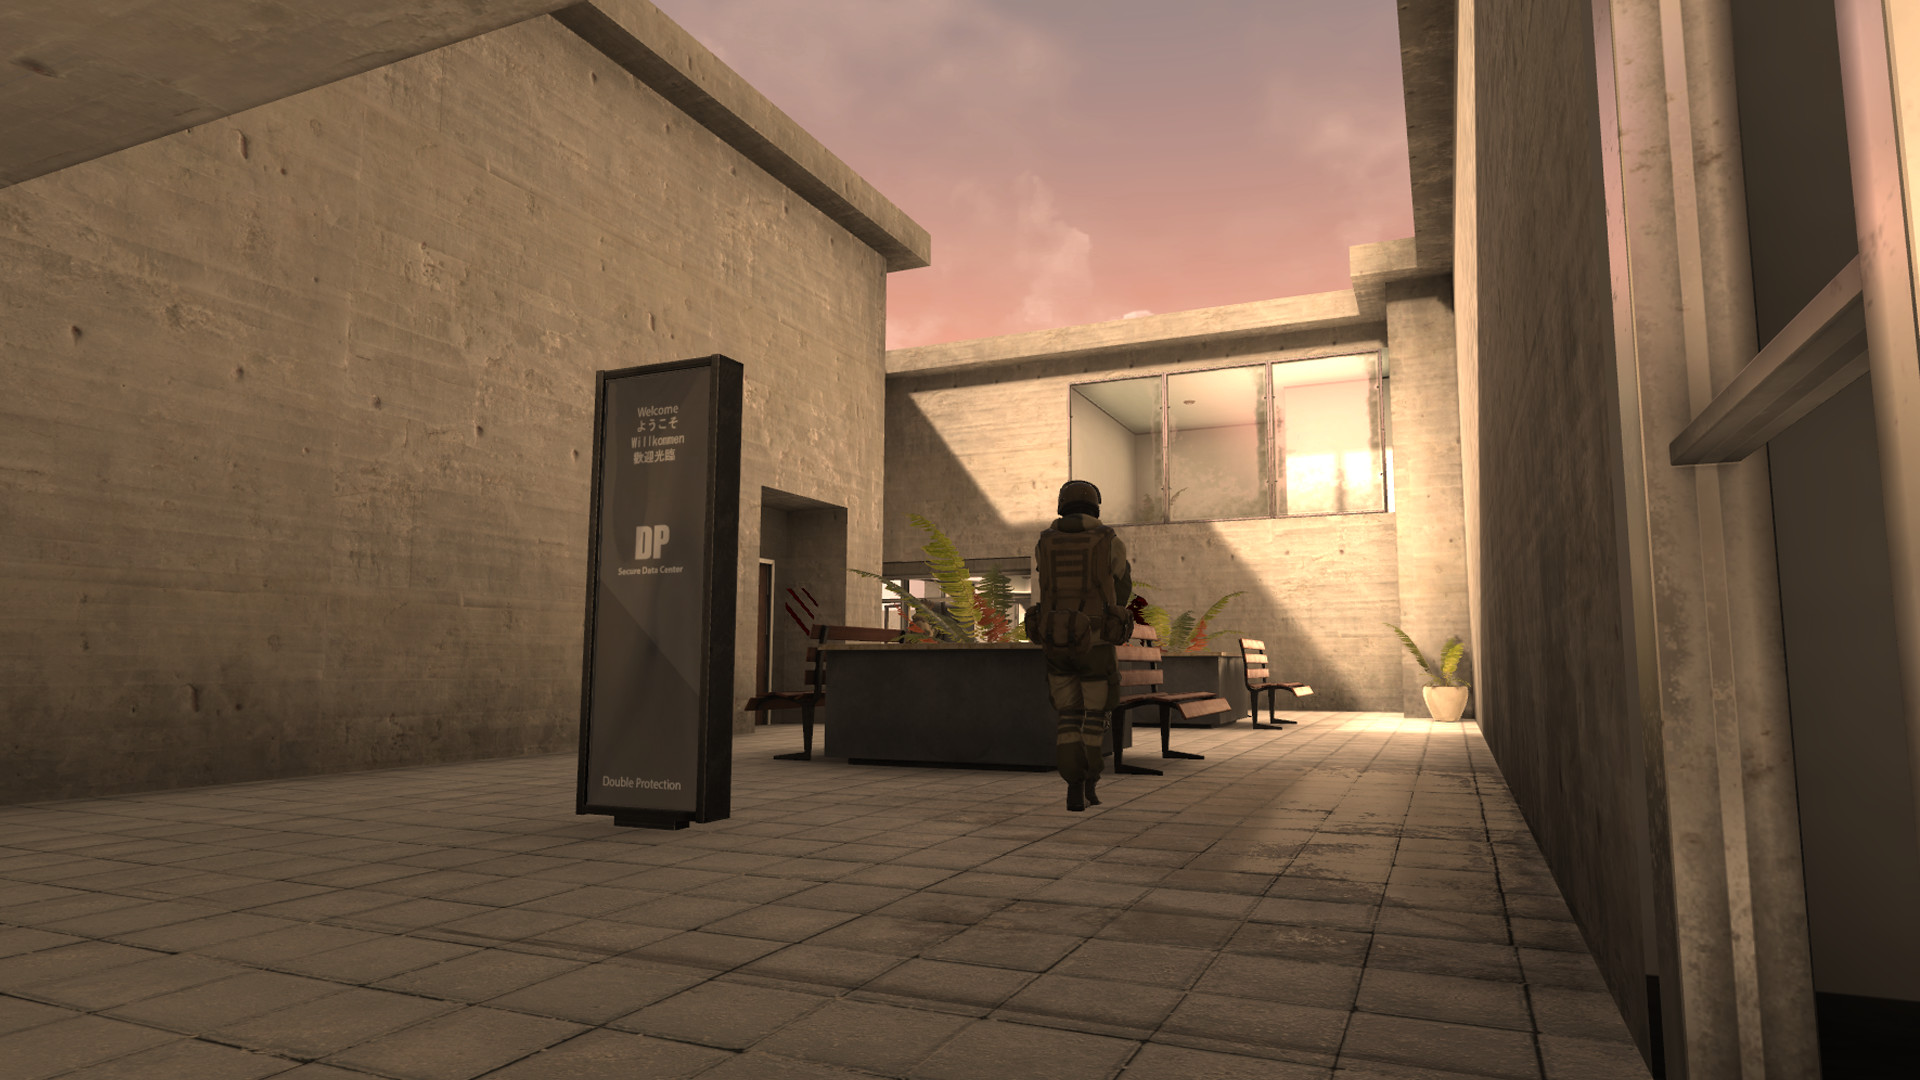 Best Oculus Quest games 2021: pavlov